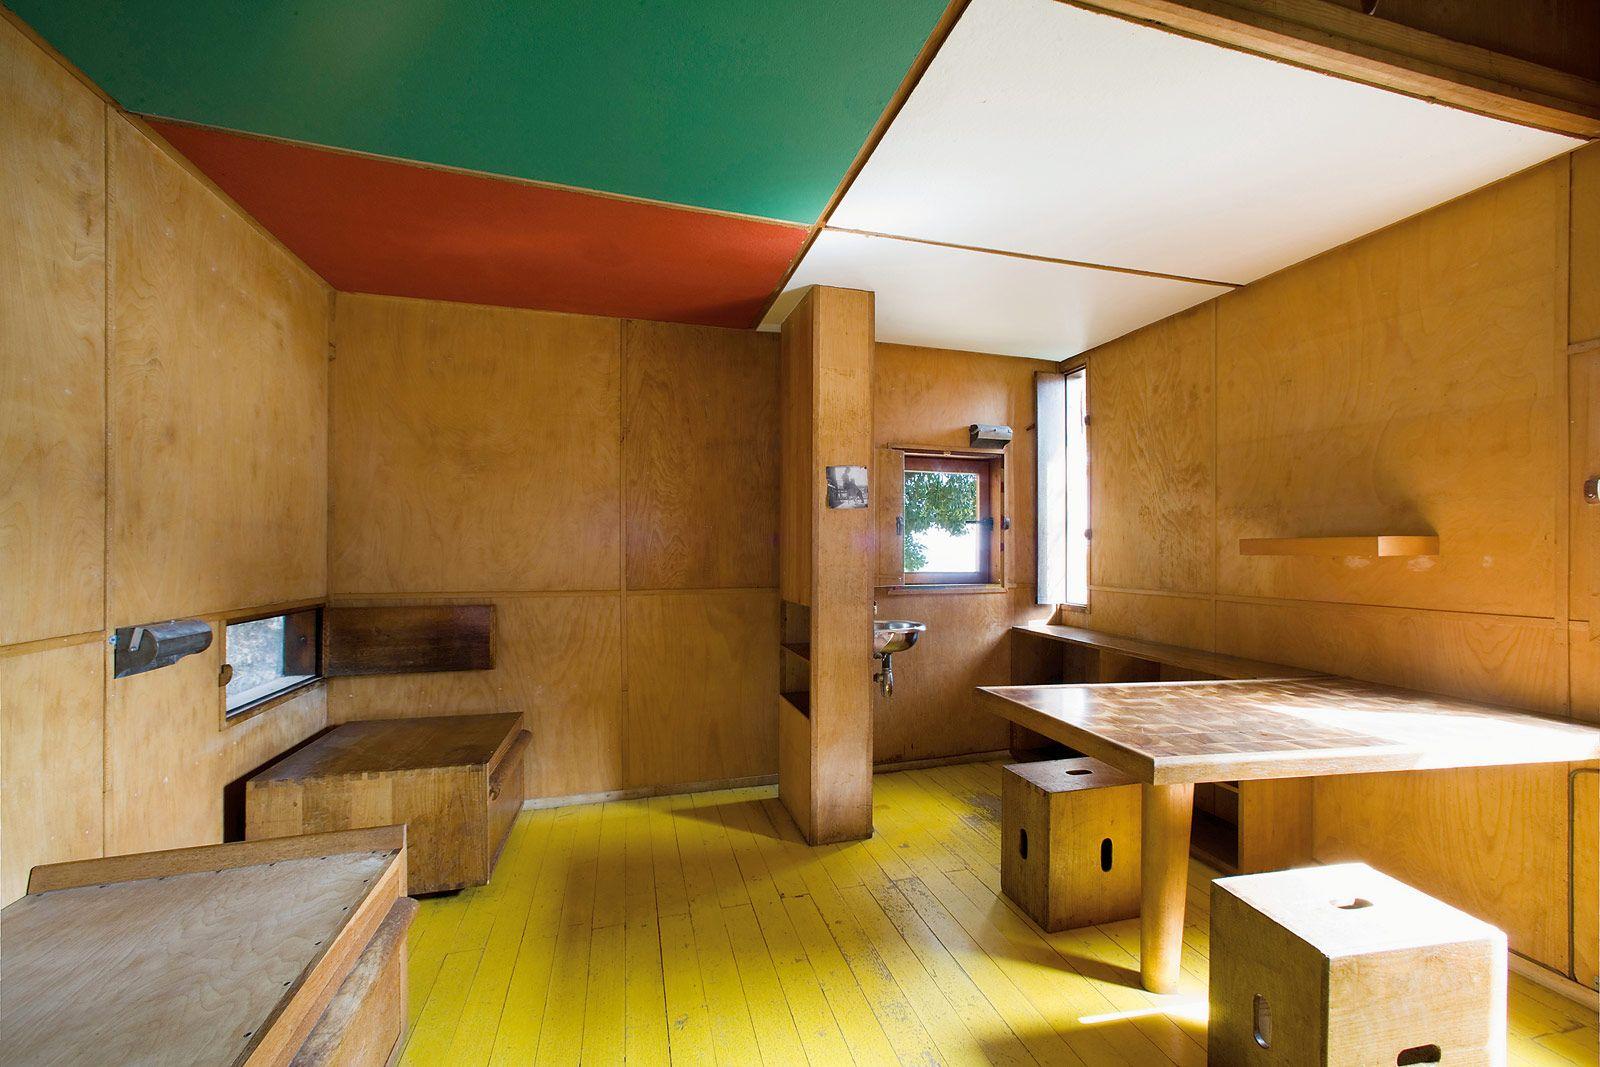 Courtesy of Fondation Le Corbusier | kitchen | Pinterest | Arch ... - Cabanon Le Corbusier